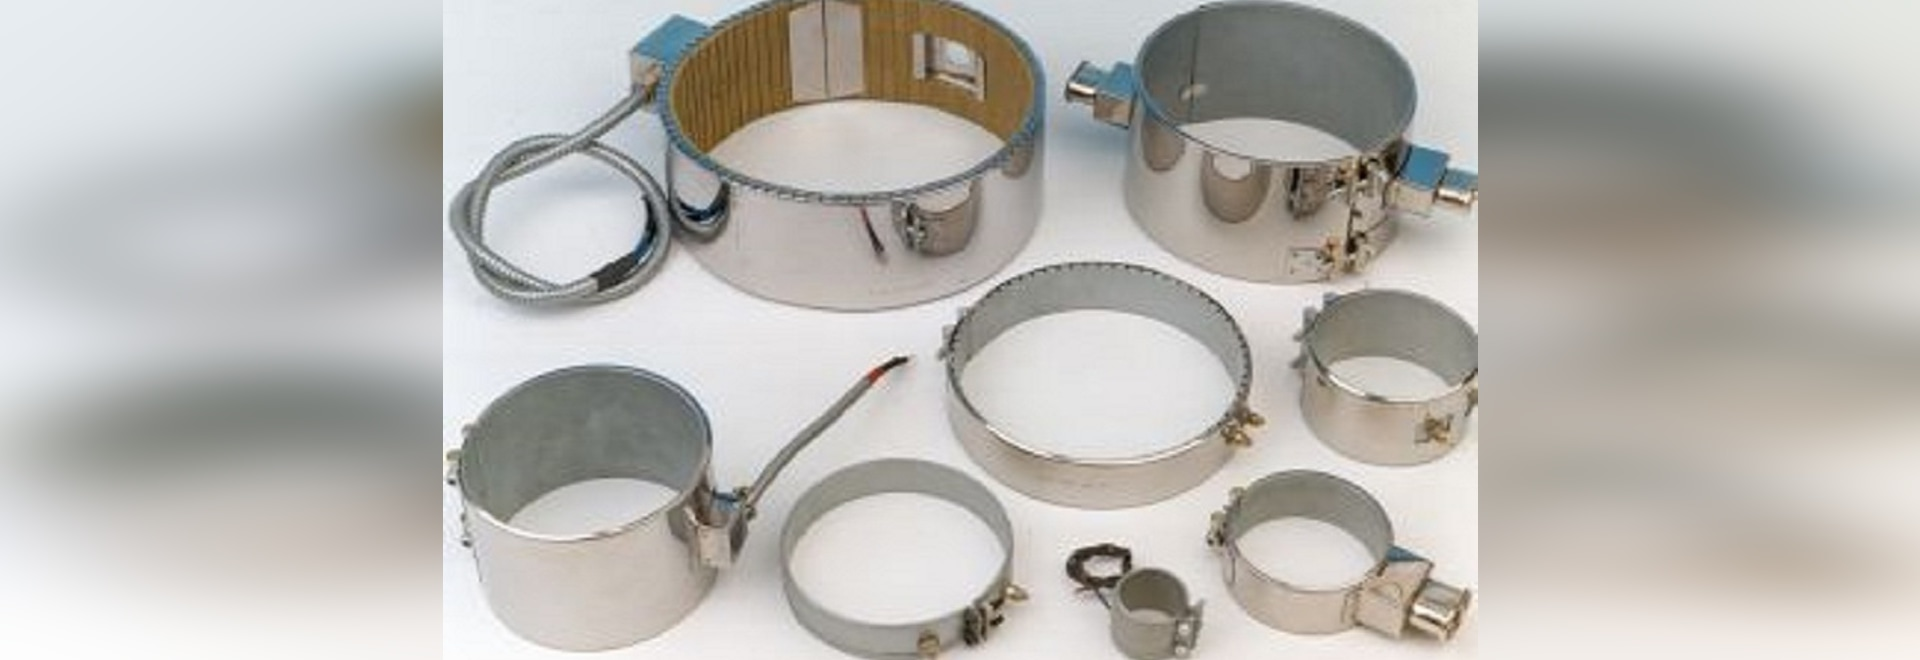 Clamp Type Electric Heating Elements Carrer De Ca Nalzamora